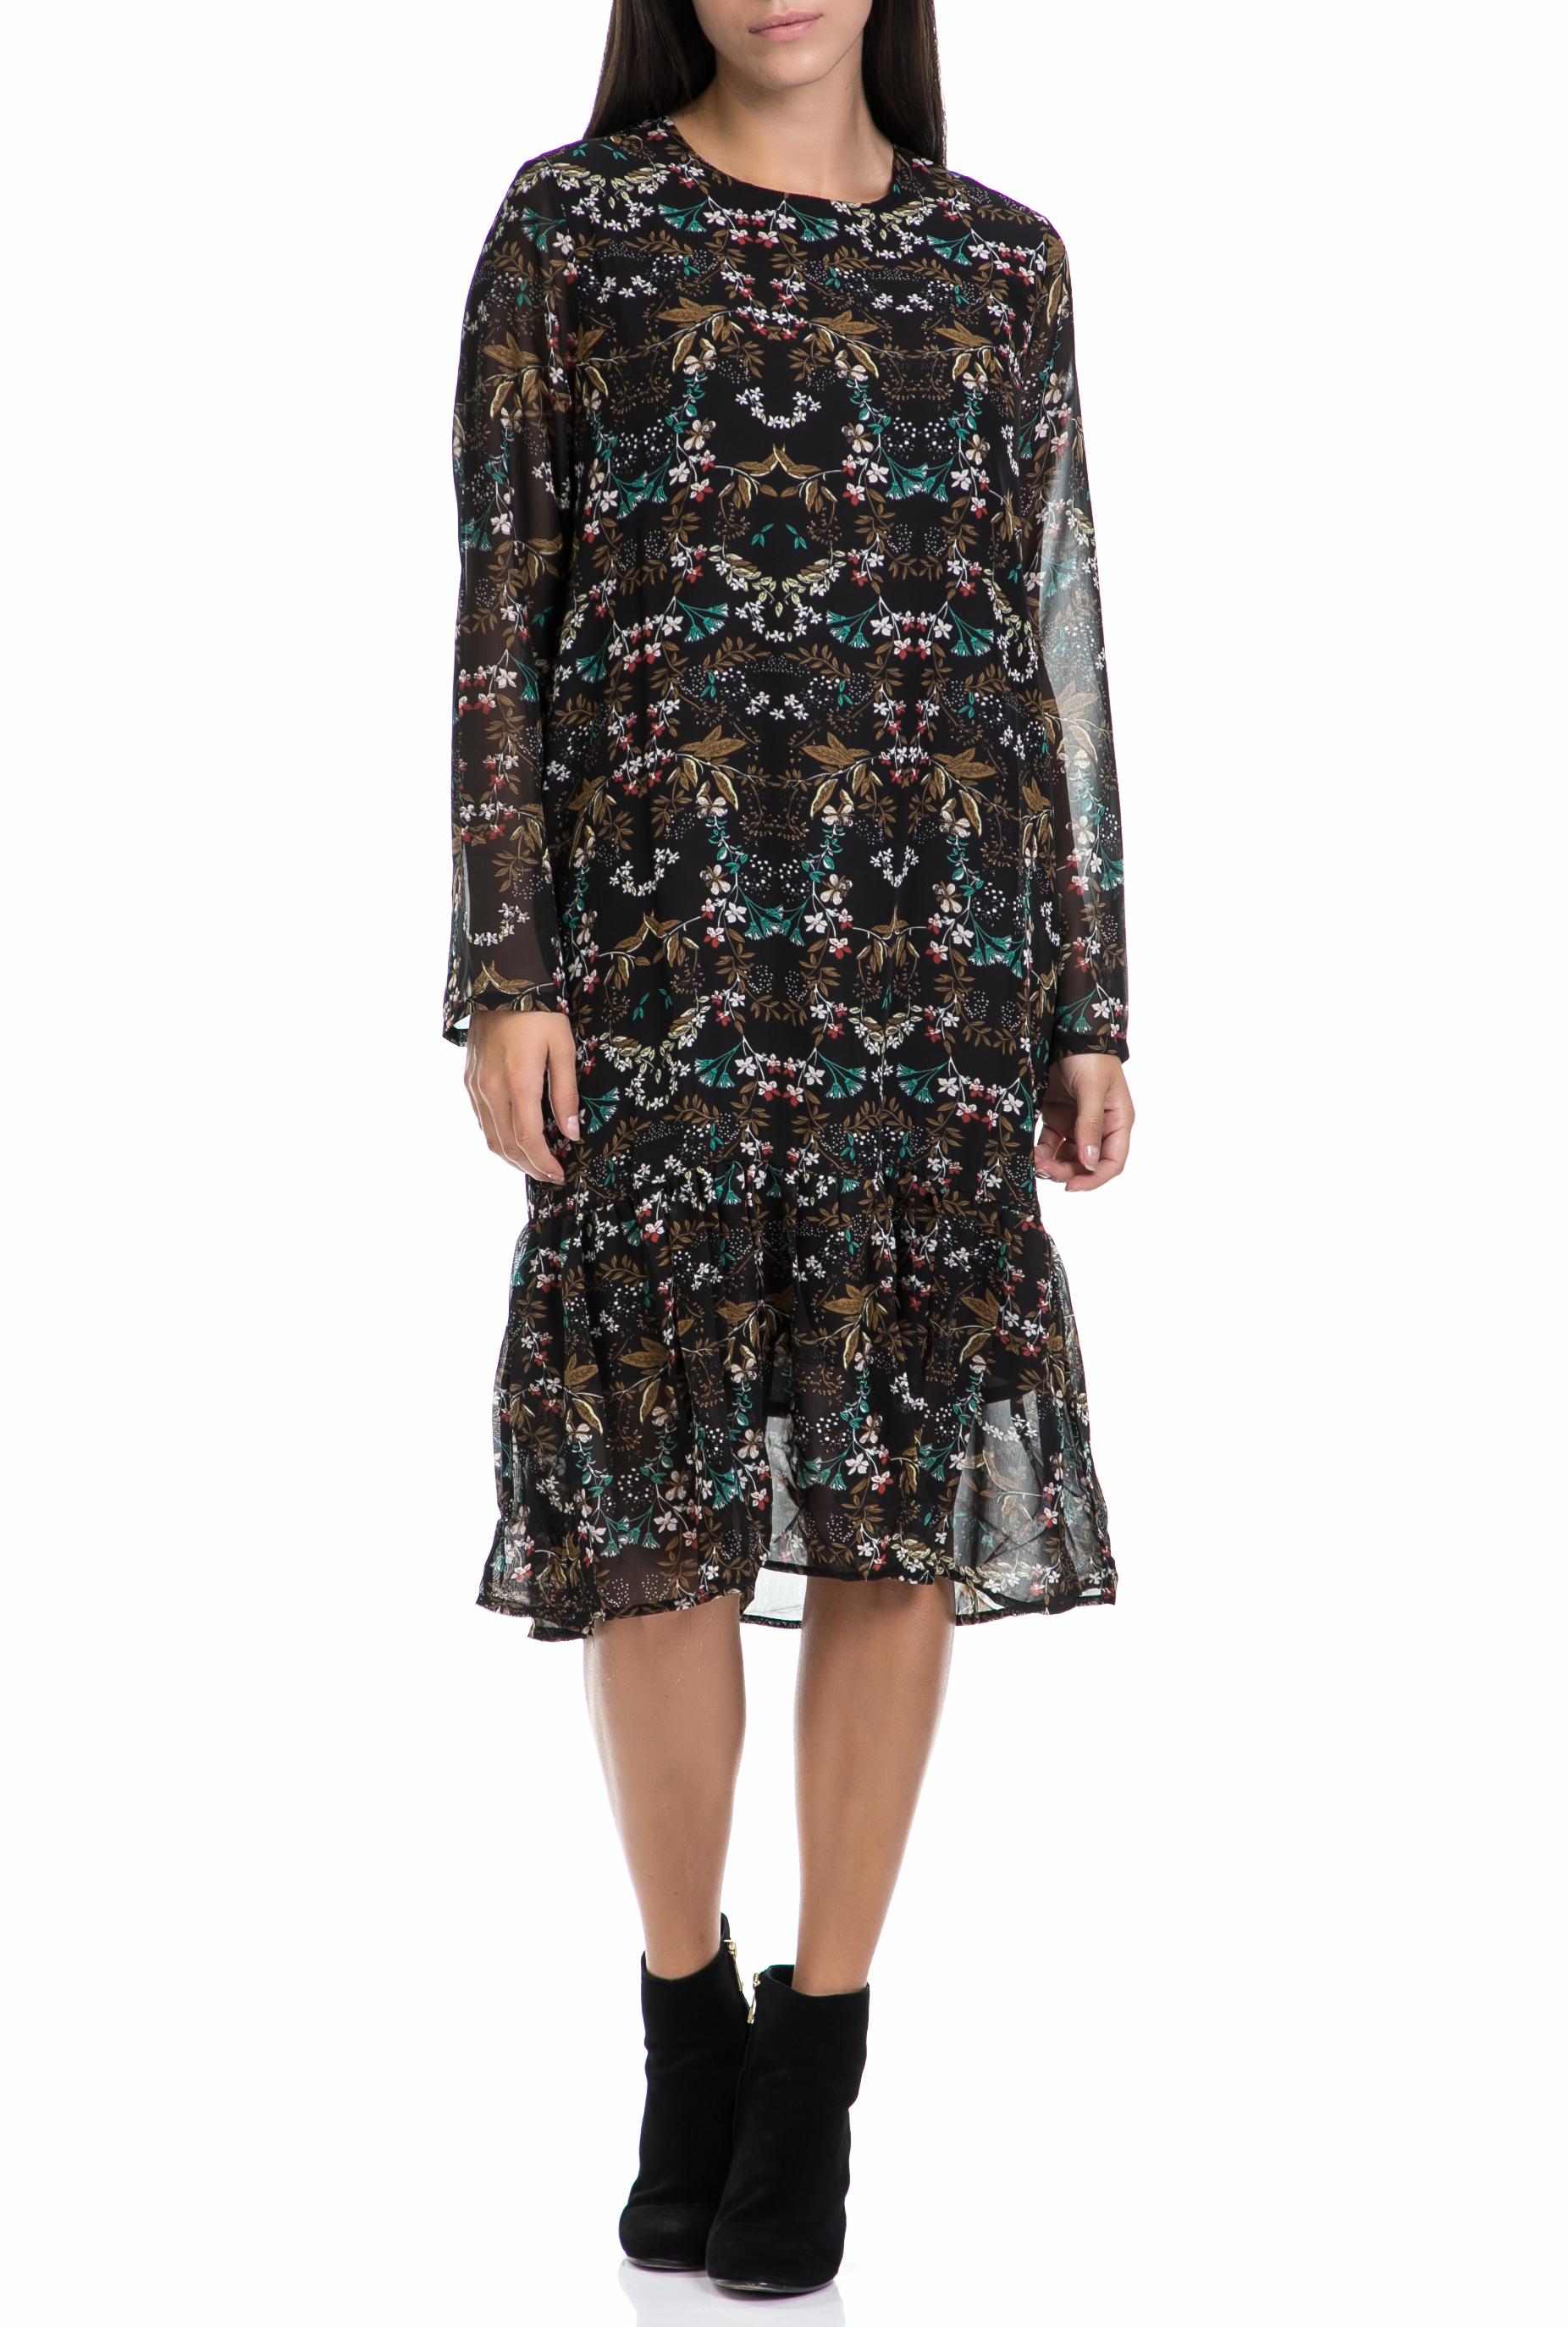 MOLLY BRACKEN - Γυναικείο φόρεμα MOLLY BRACKEN μαύρο-εμπριμέ γυναικεία ρούχα φορέματα μέχρι το γόνατο